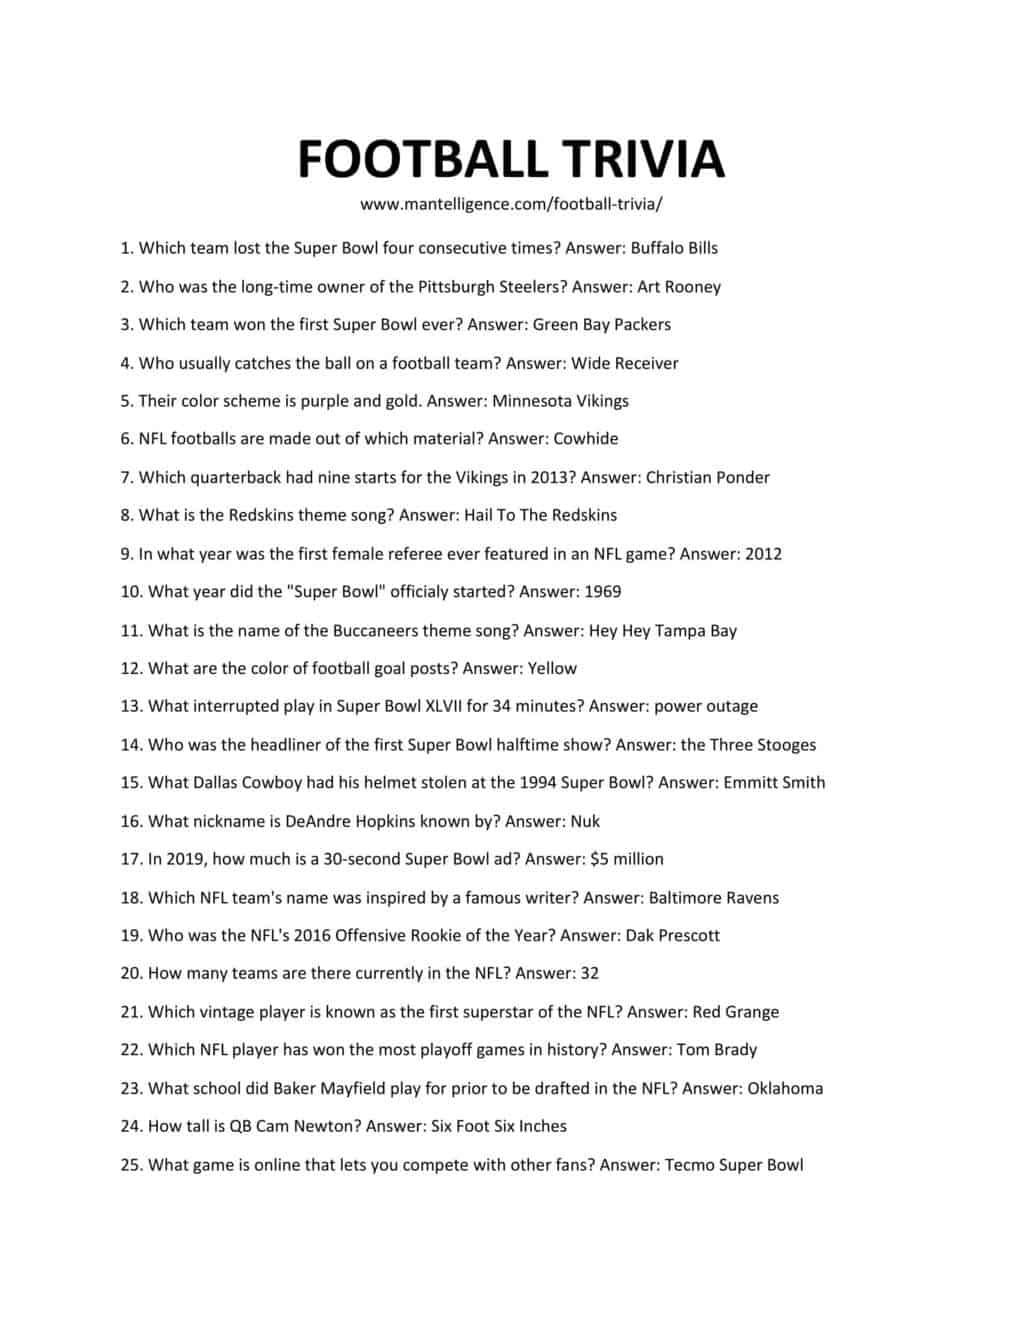 Downloadable and printable list of football trivia as jpg or pdf